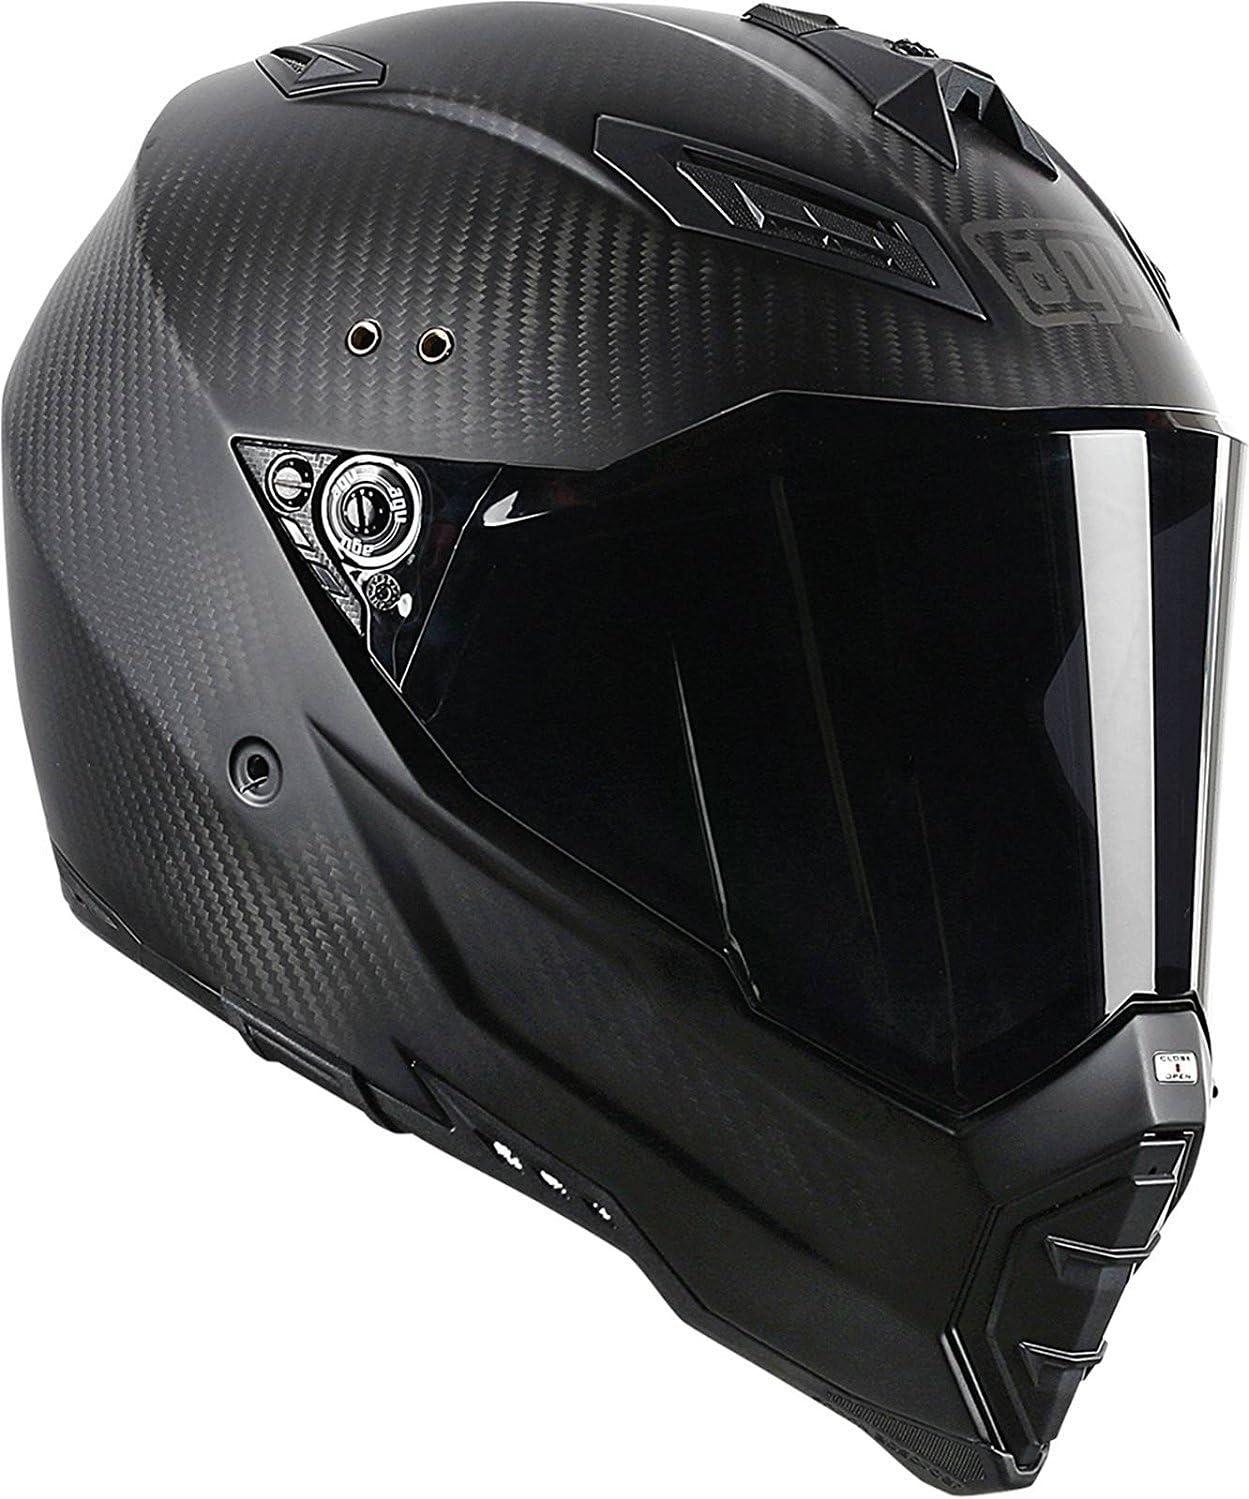 AGV AX-8 EVO Naked Carbon Fury Helmet at BikeBandit.com